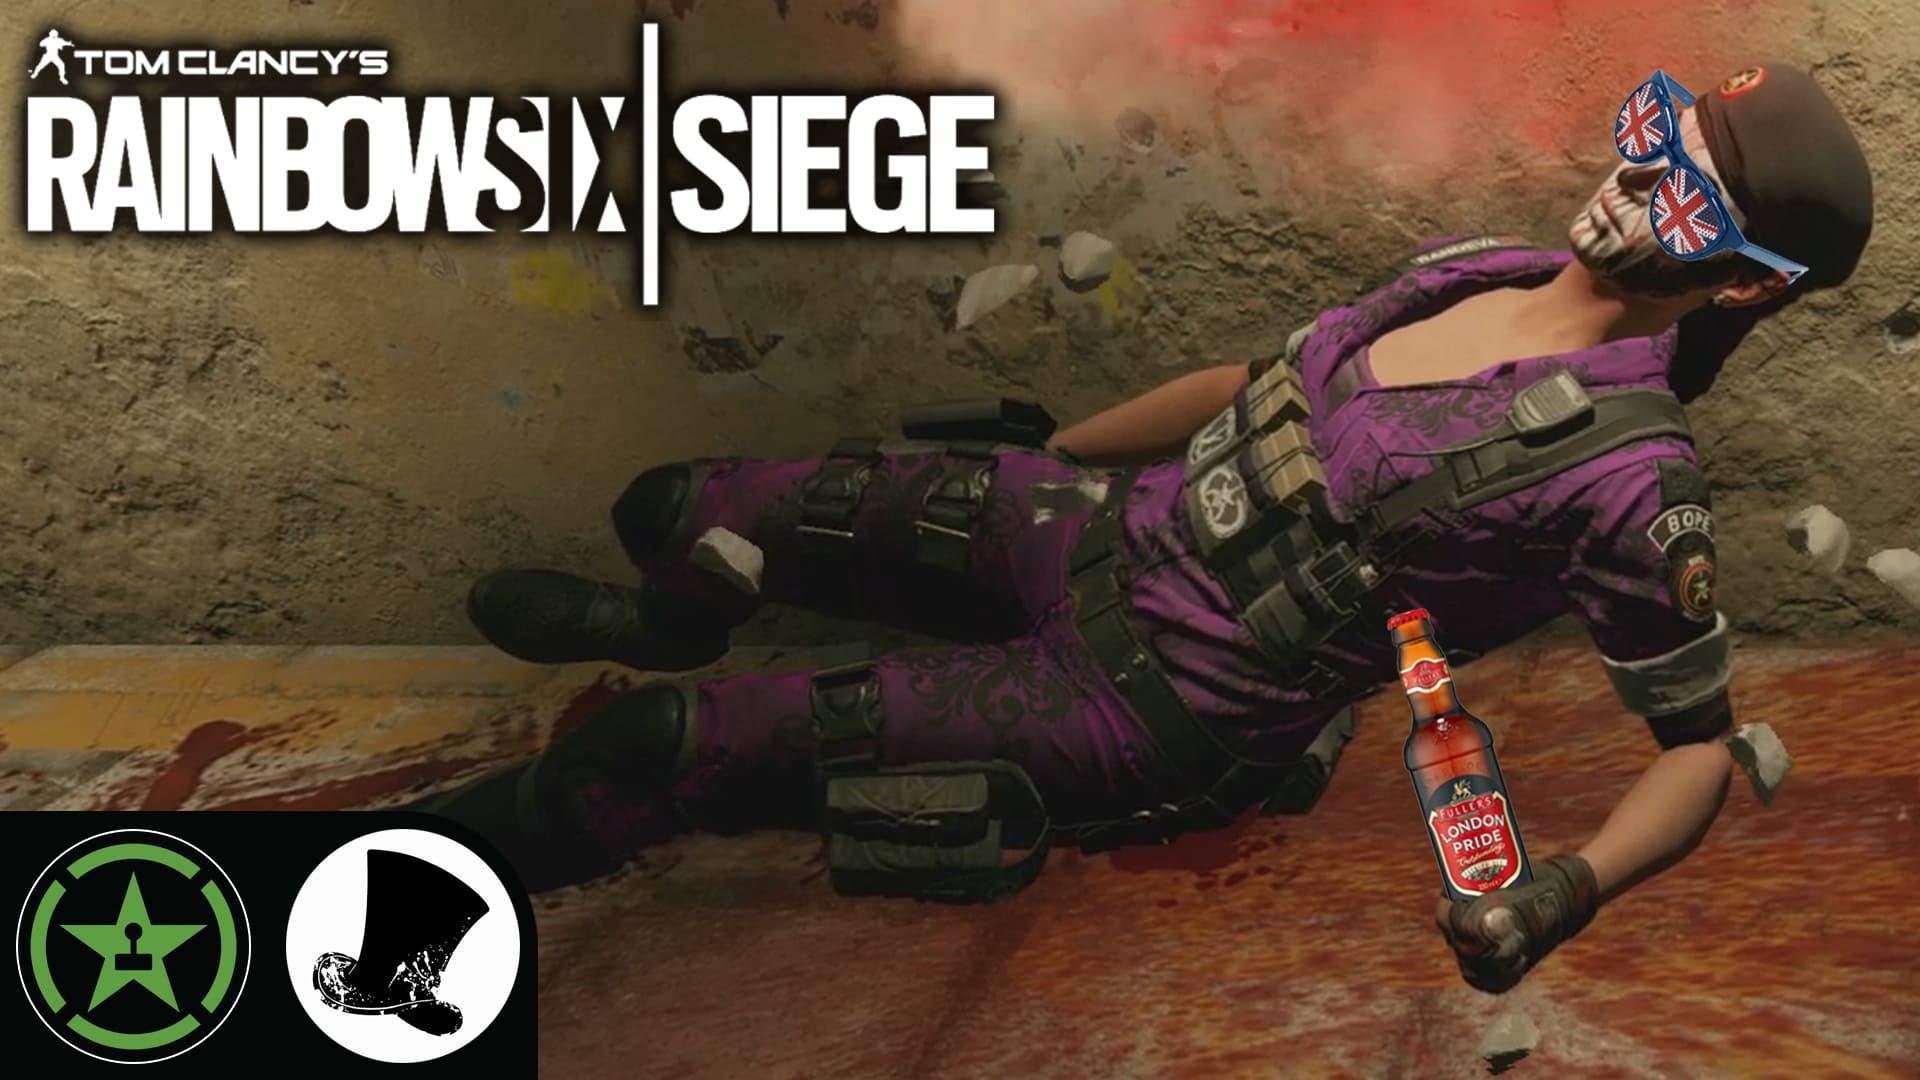 Fight with British Security - Rainbow Six: Siege - (Round 2